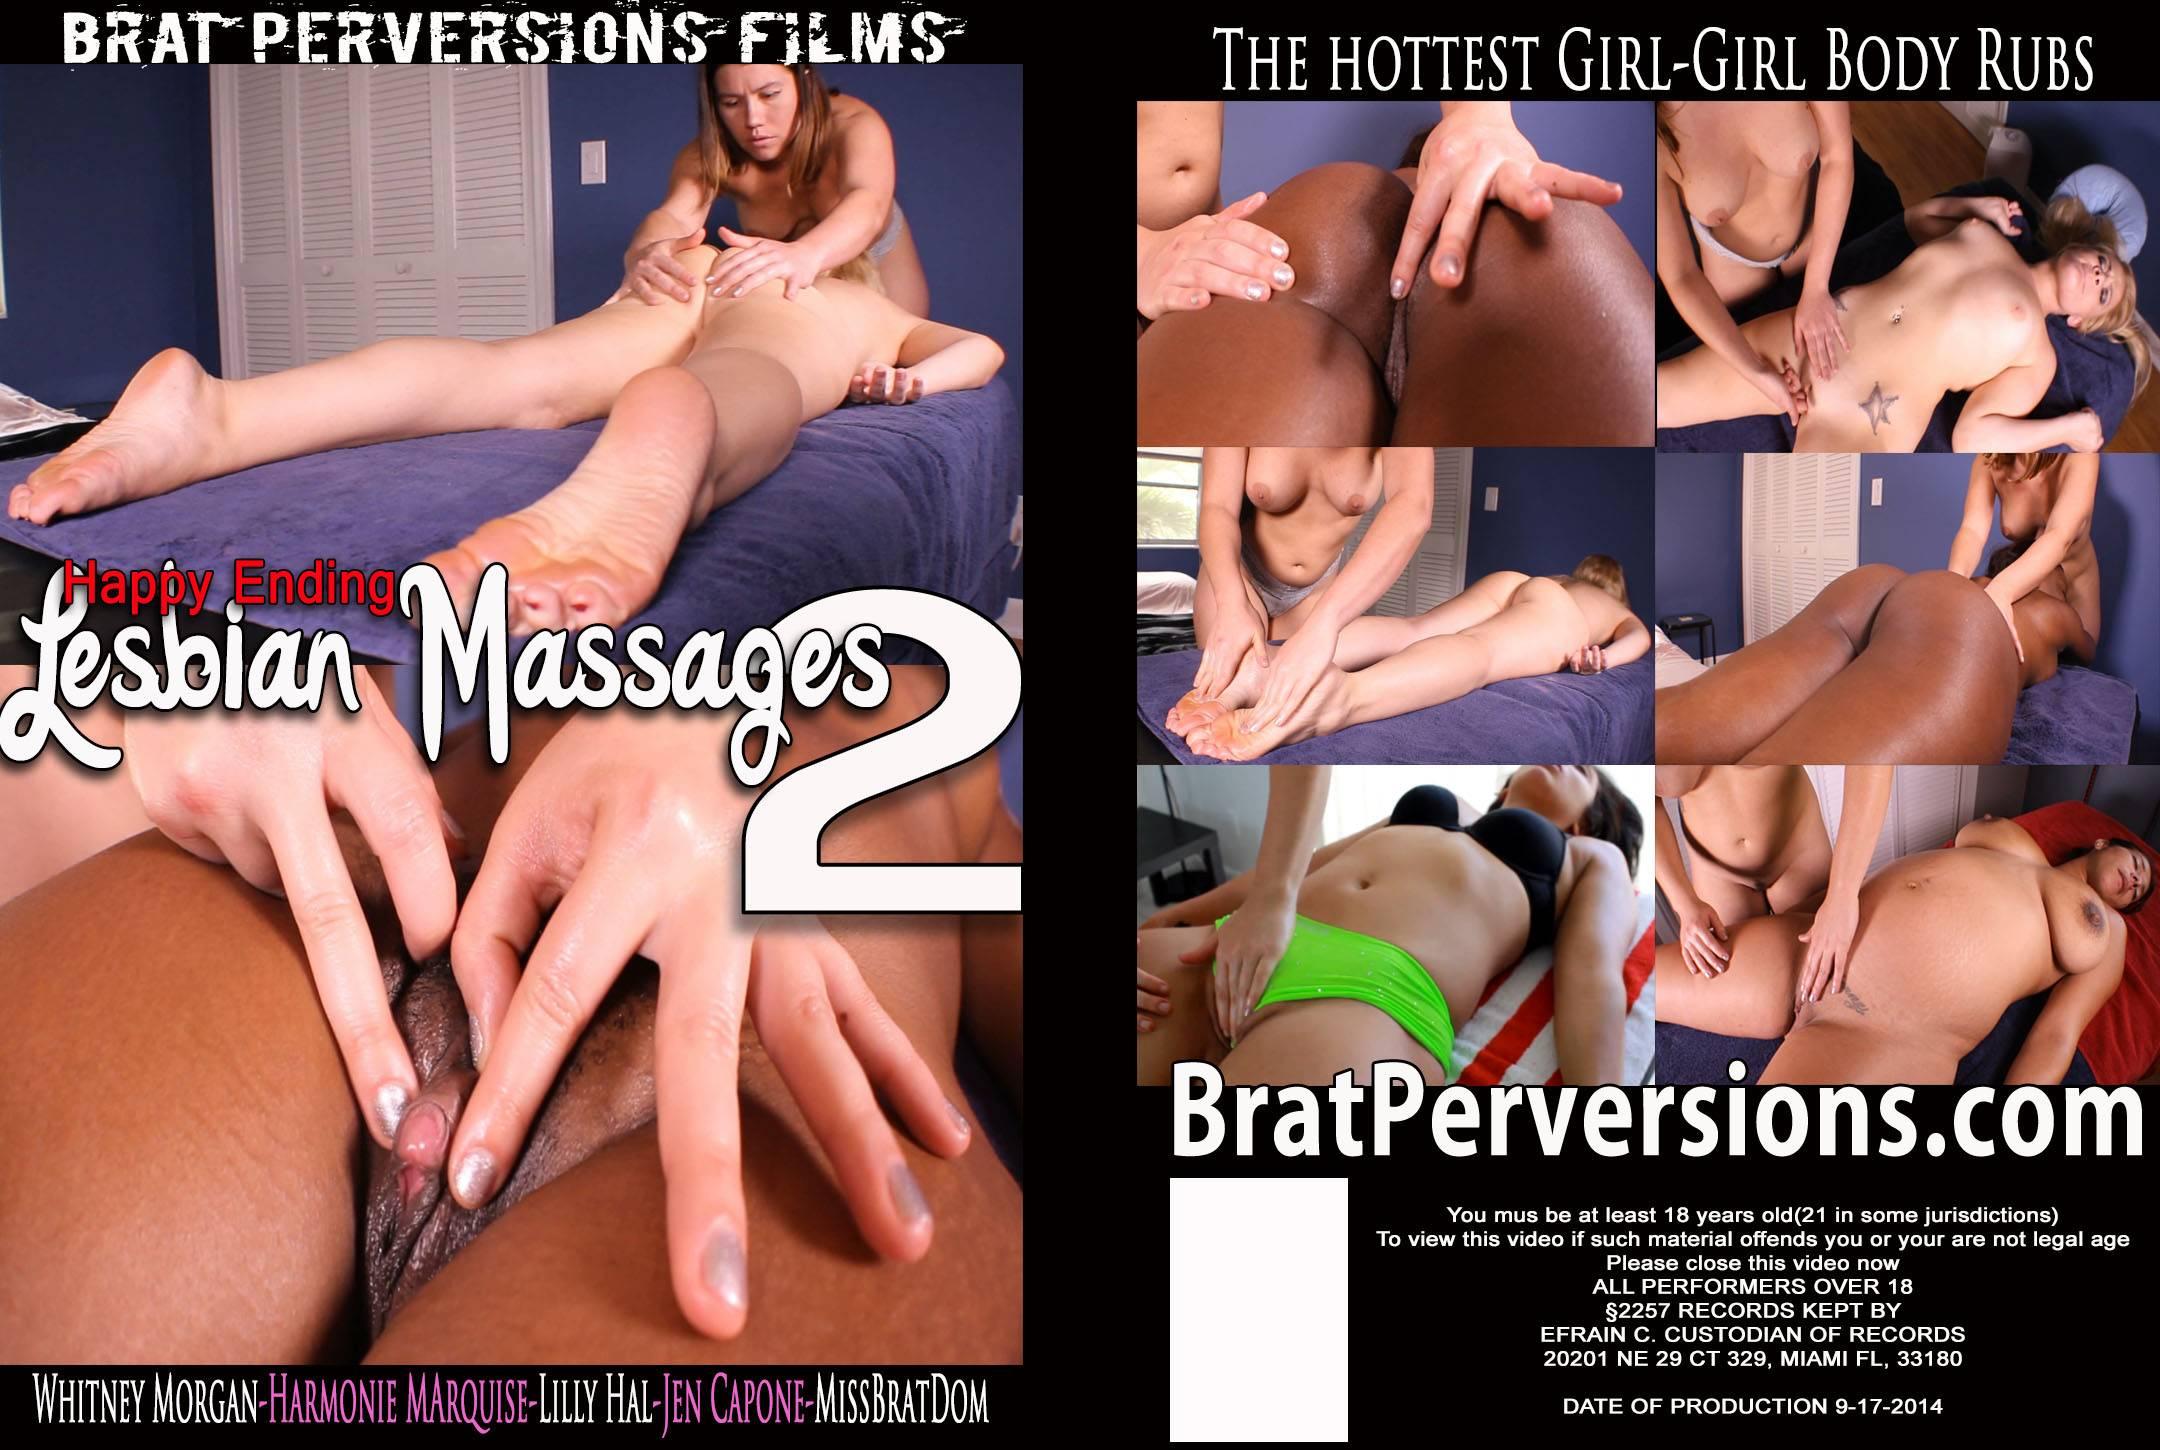 Lesbians Massage 2